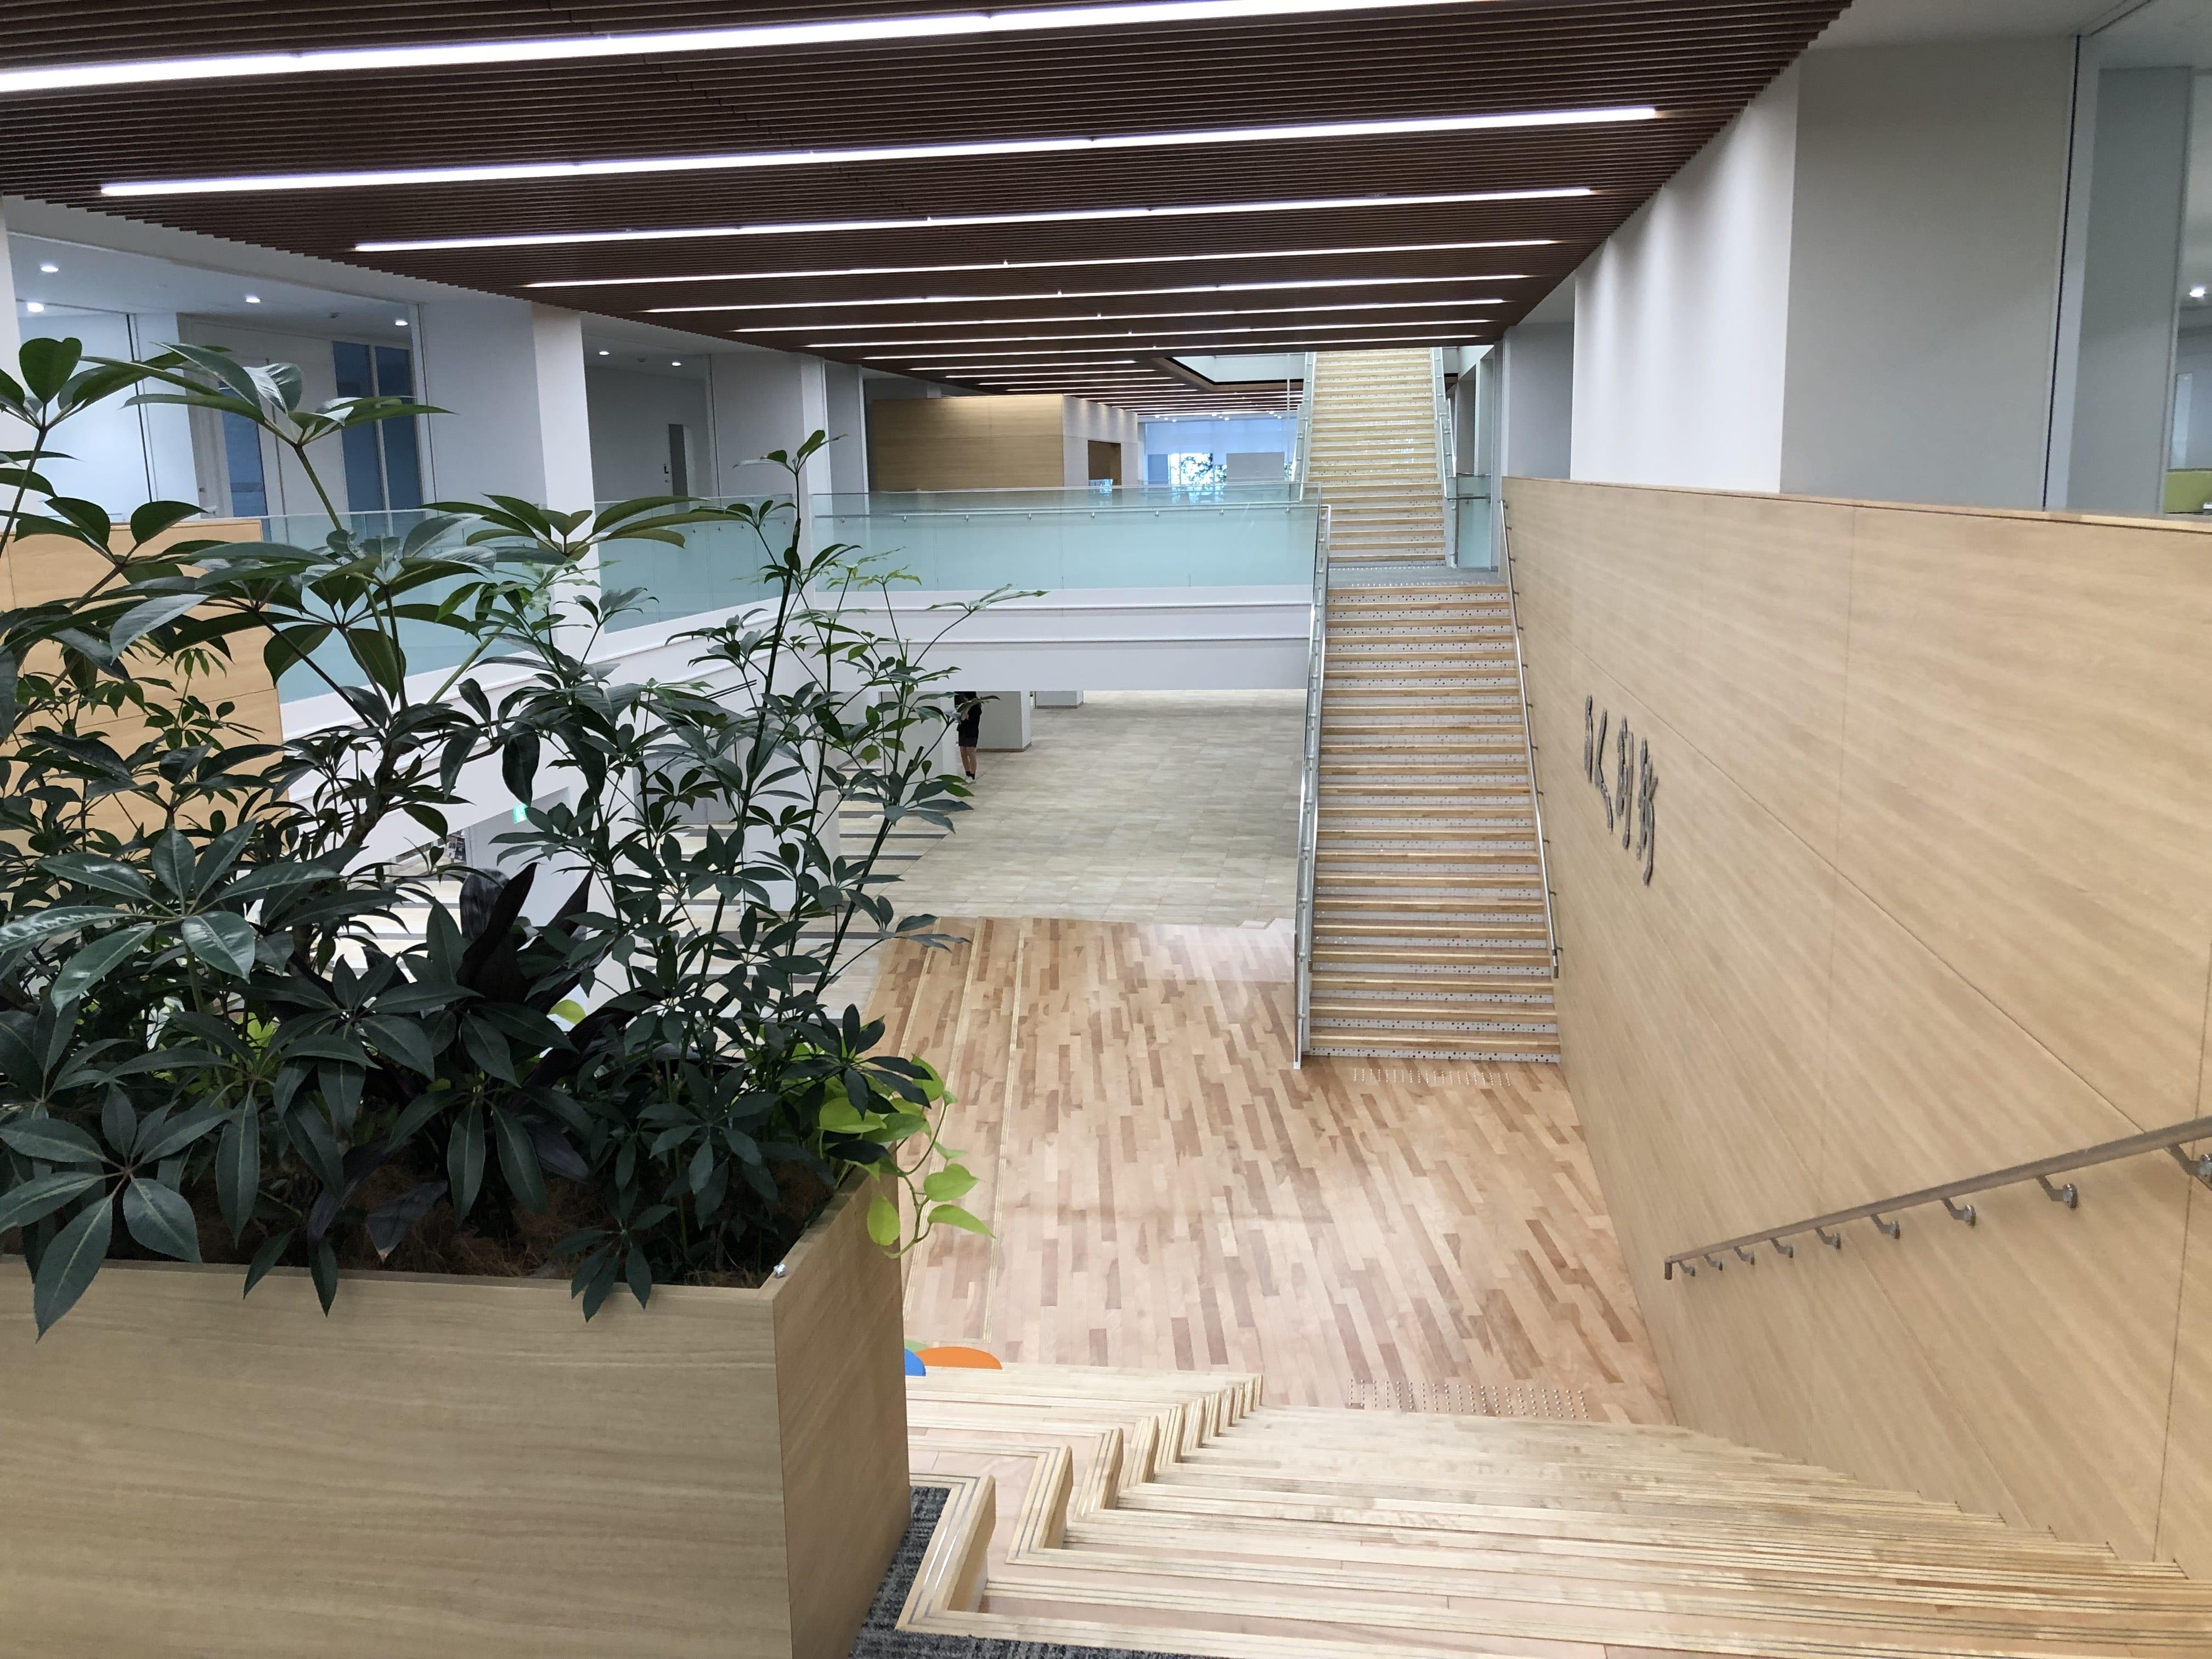 Oberlin University - Shinjuku Campus - photo 16